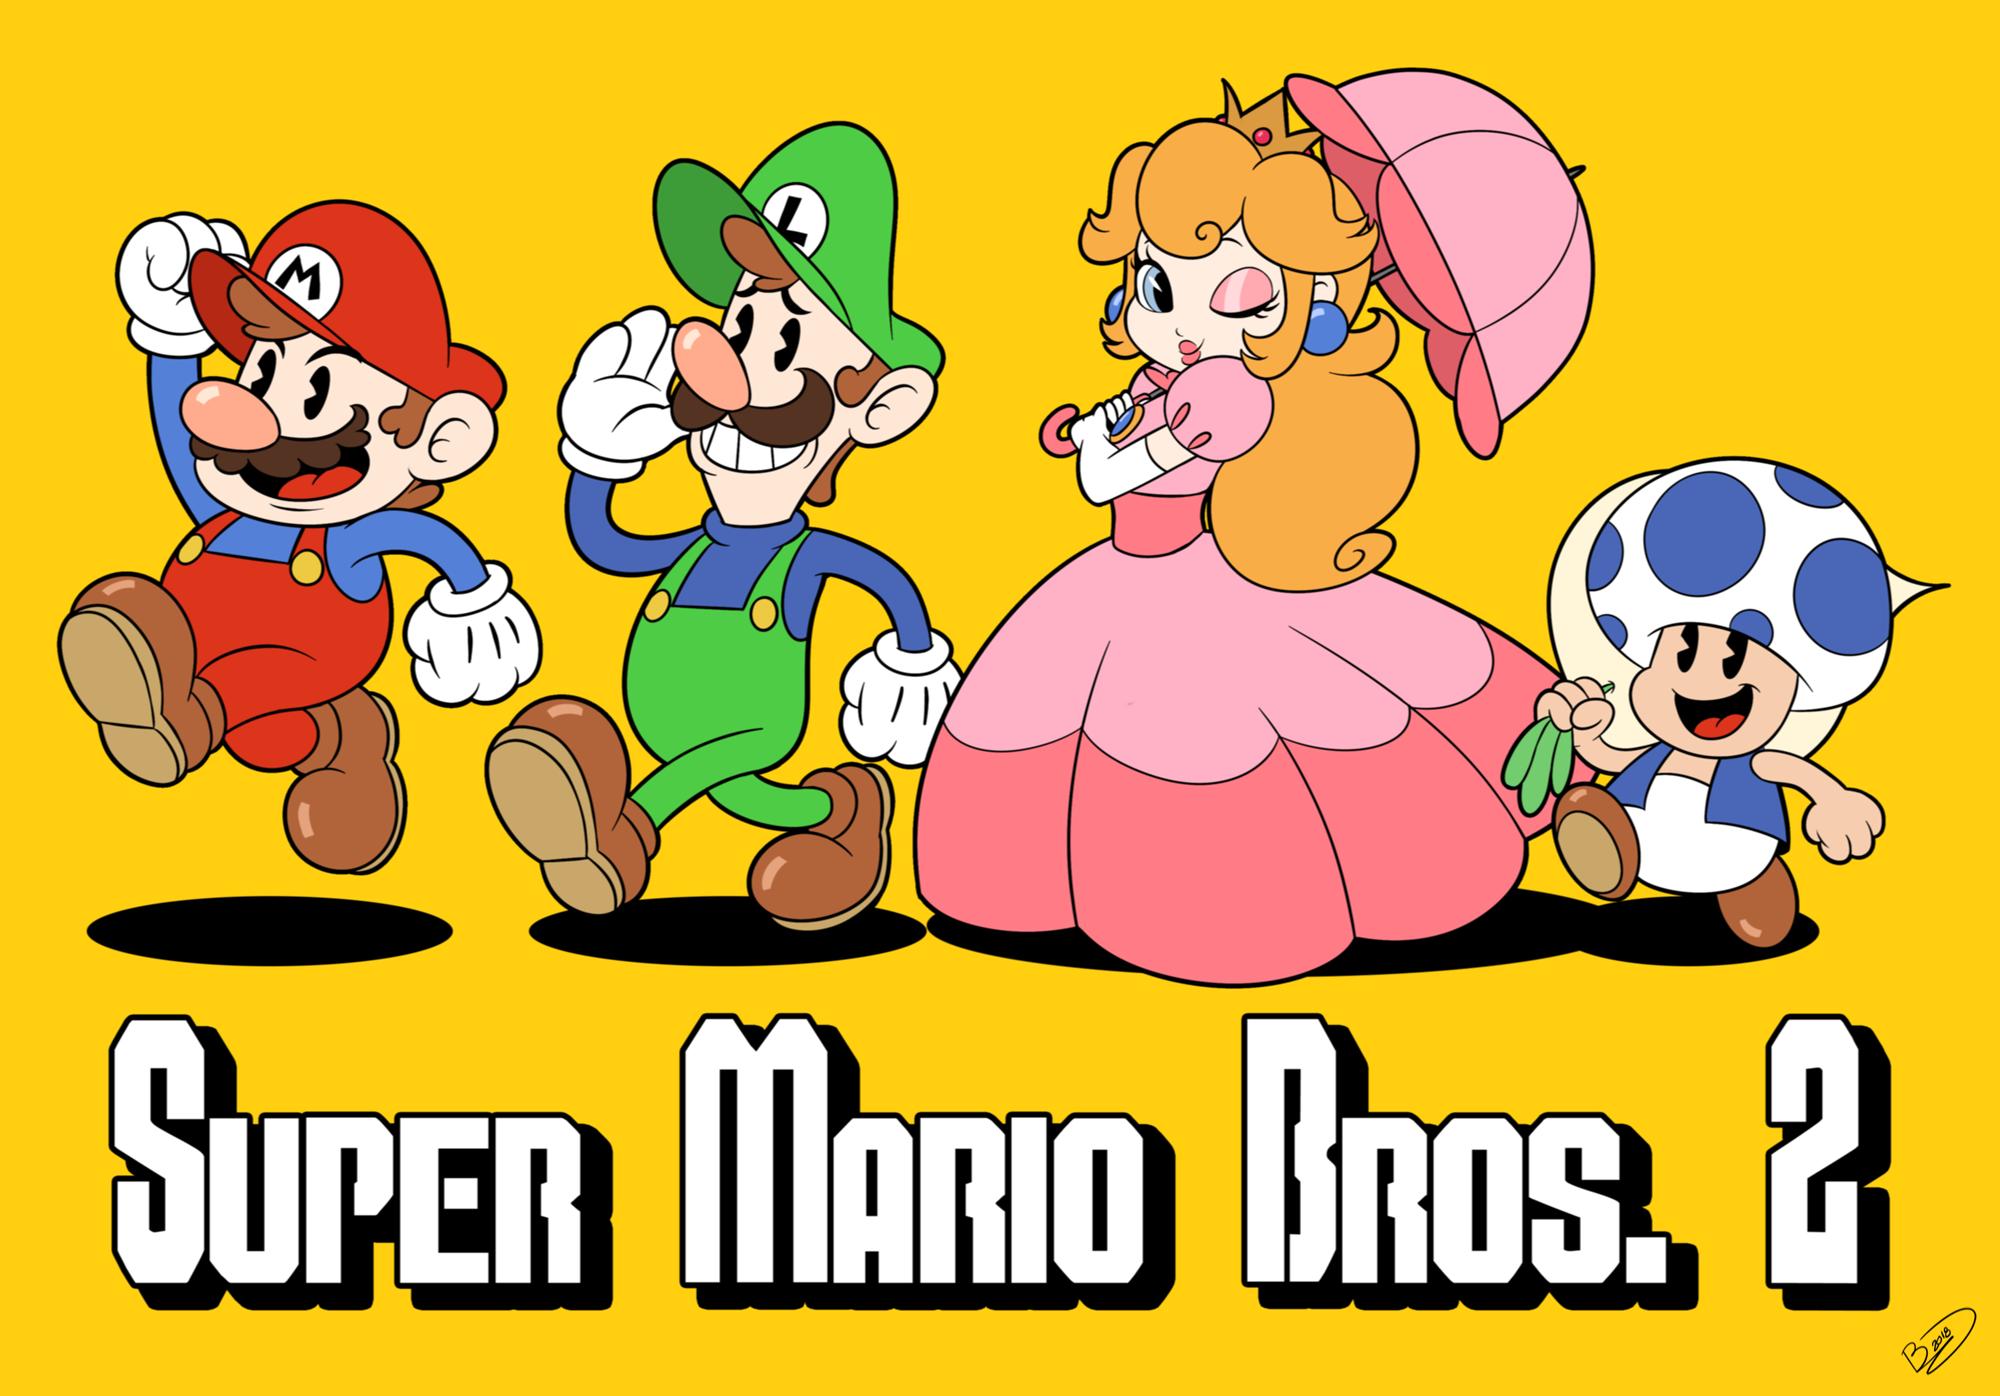 Super Mario Bros 2 By Zieghost On Deviantart